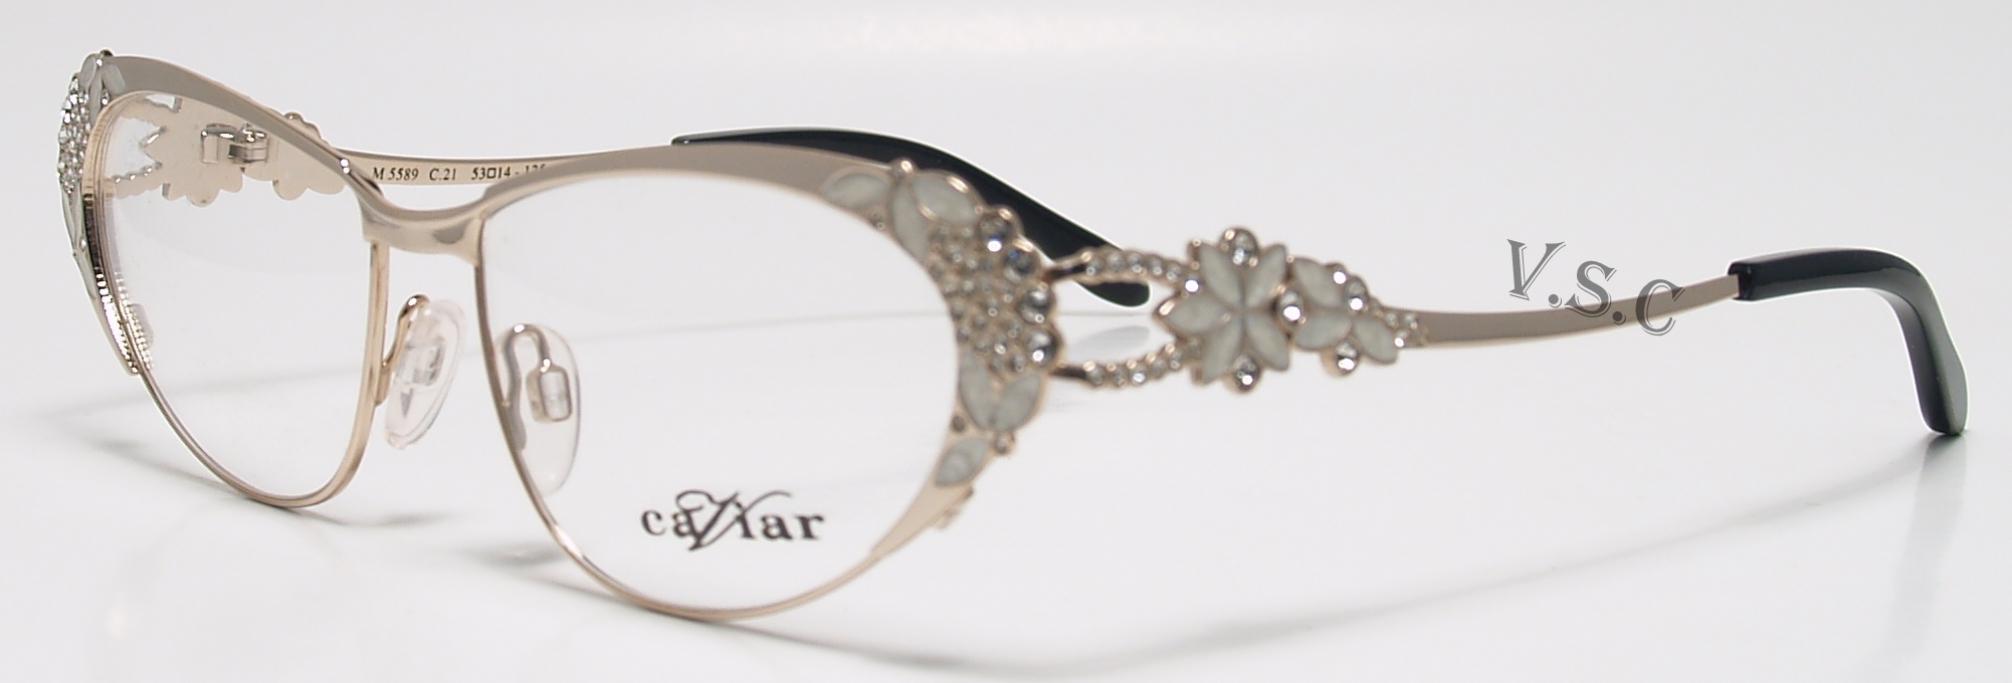 Buy Caviar Eyeglasses directly from eyeglassesdepot.com